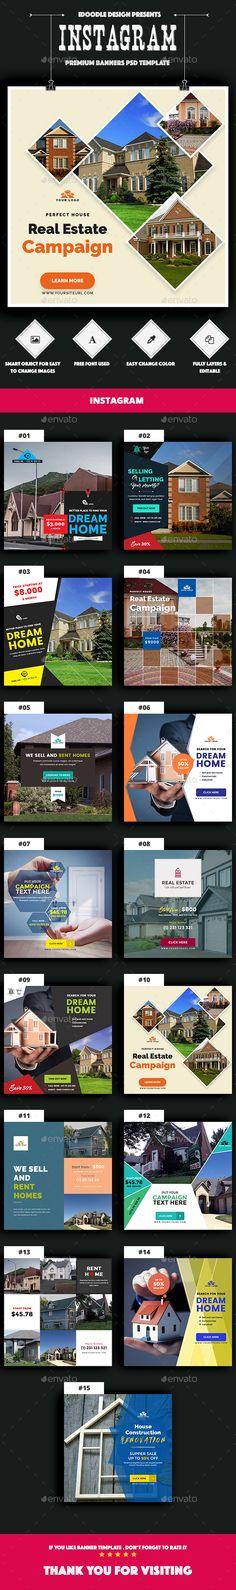 Real Estate Instagram Banners Ads - 15 PSD - Social Media Web Elements